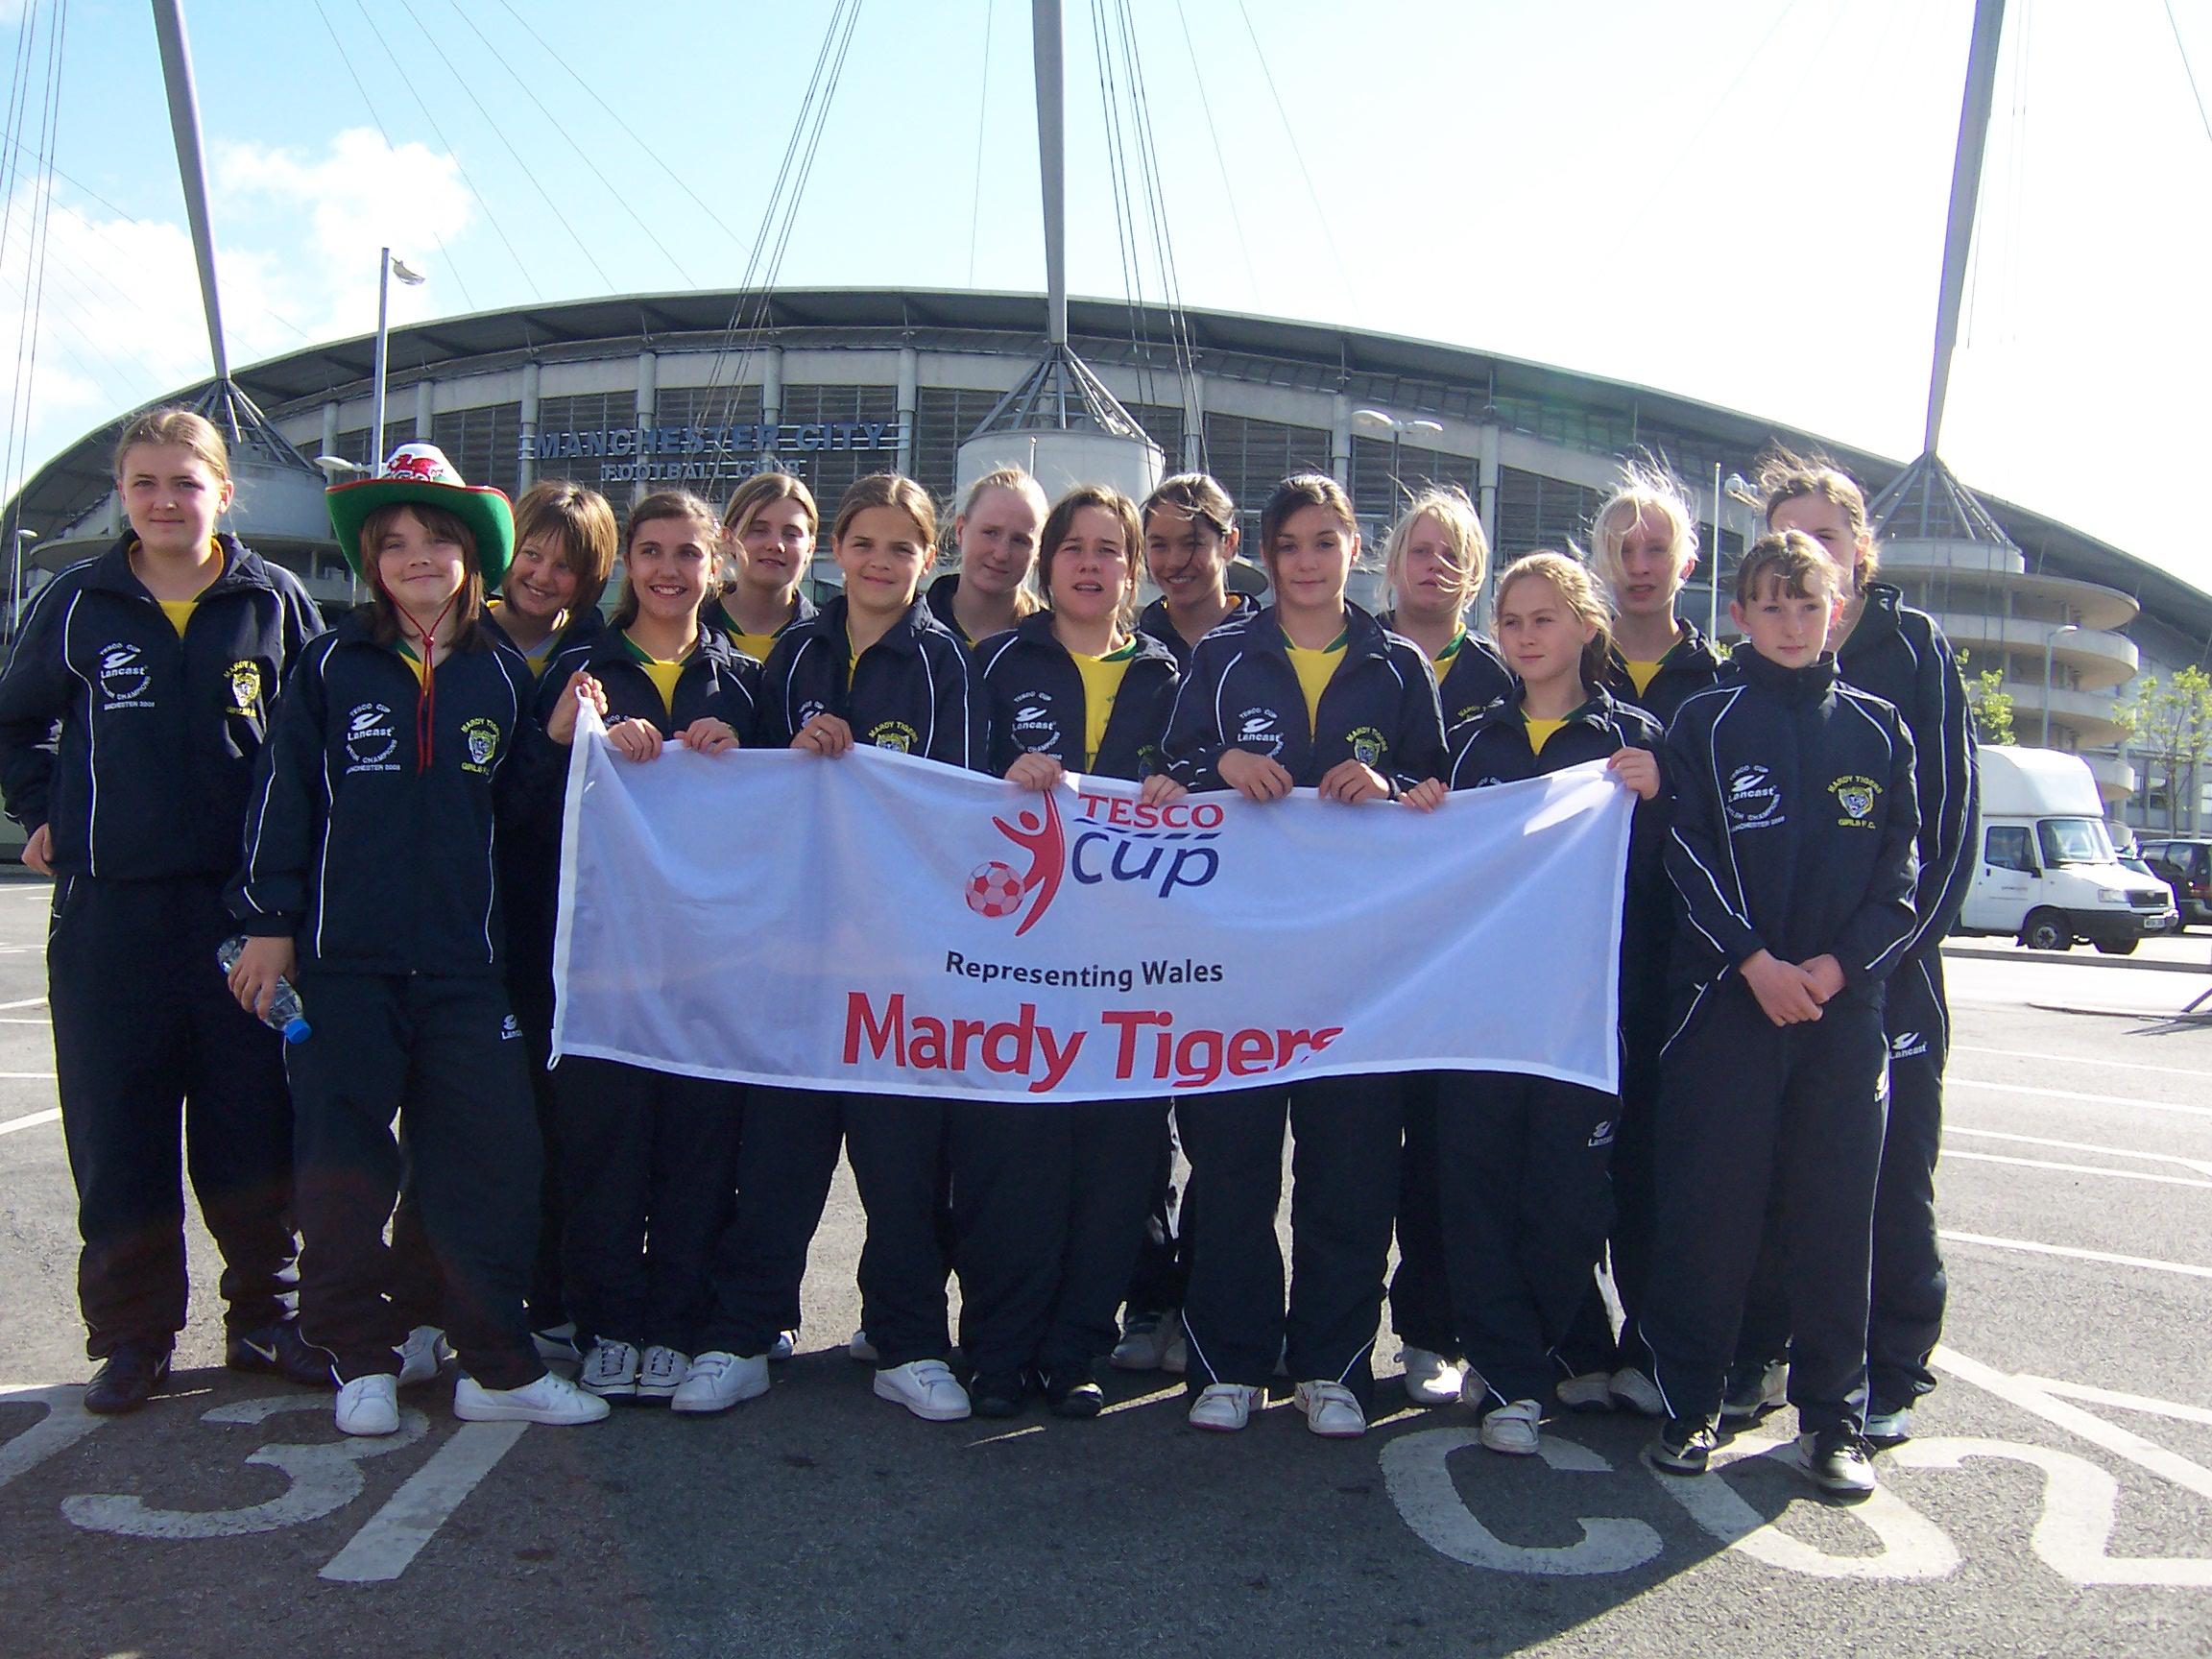 Mardy Tigers F.C.